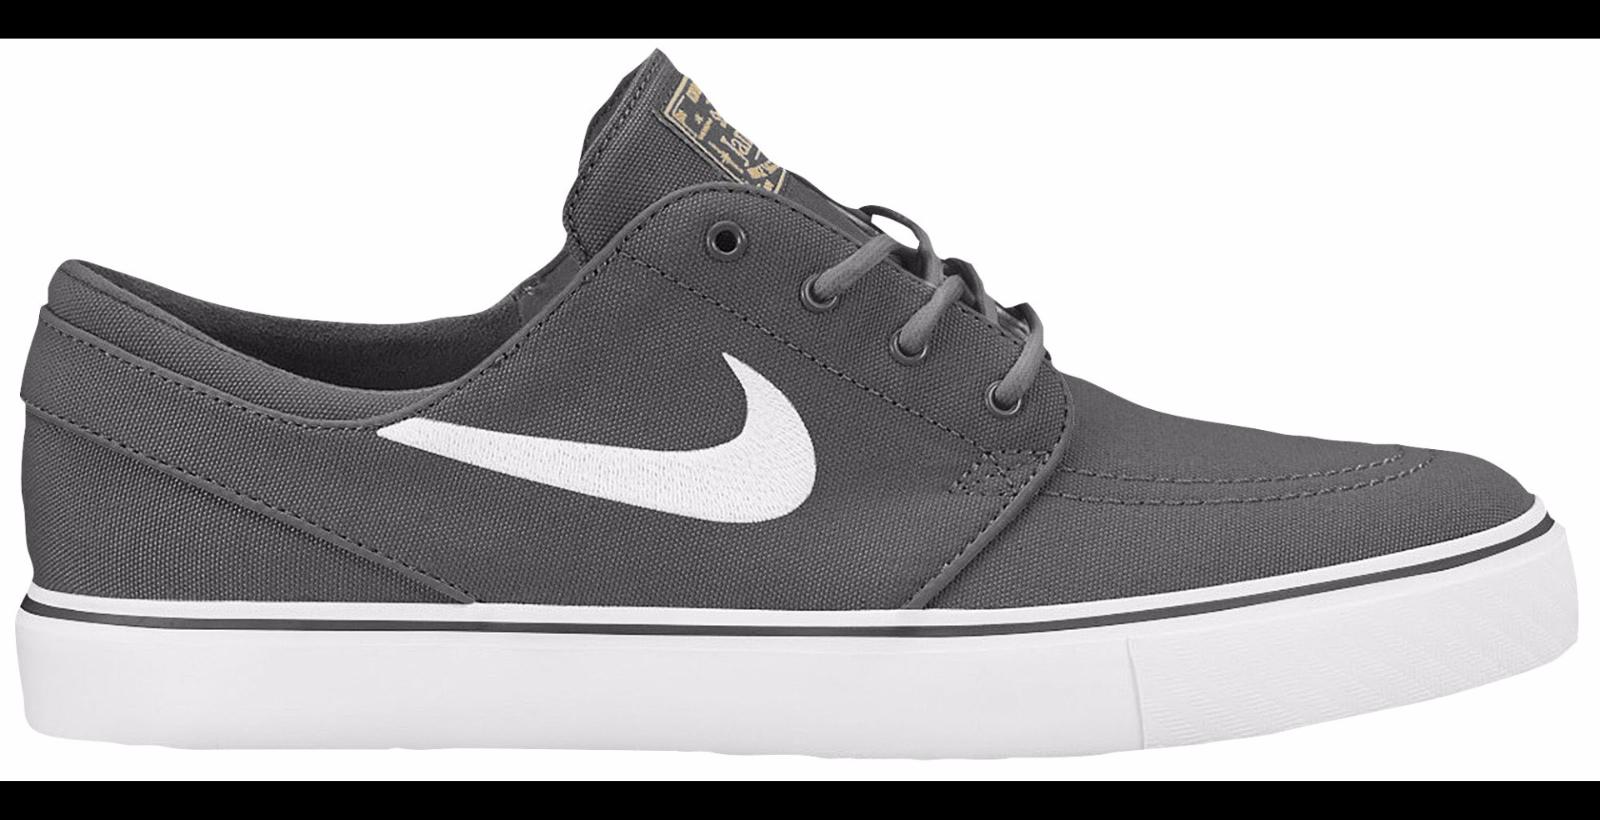 7fa48f2d6e87 Nike Zoom Stefan Janoski Dark Grey Canvas Men s Skateboard Sz 6 ...